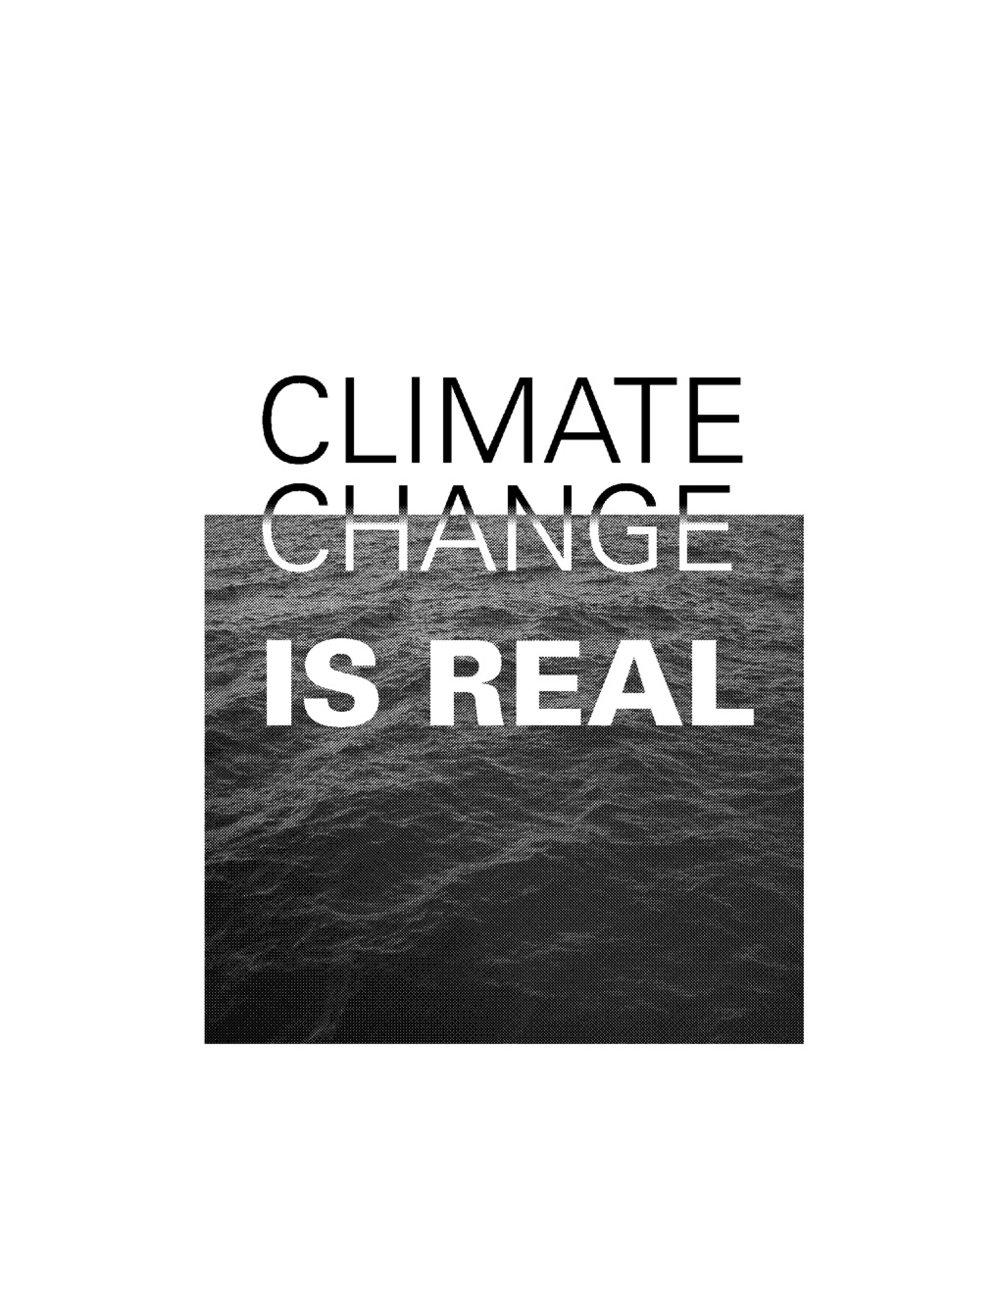 climatechange_screen.jpg